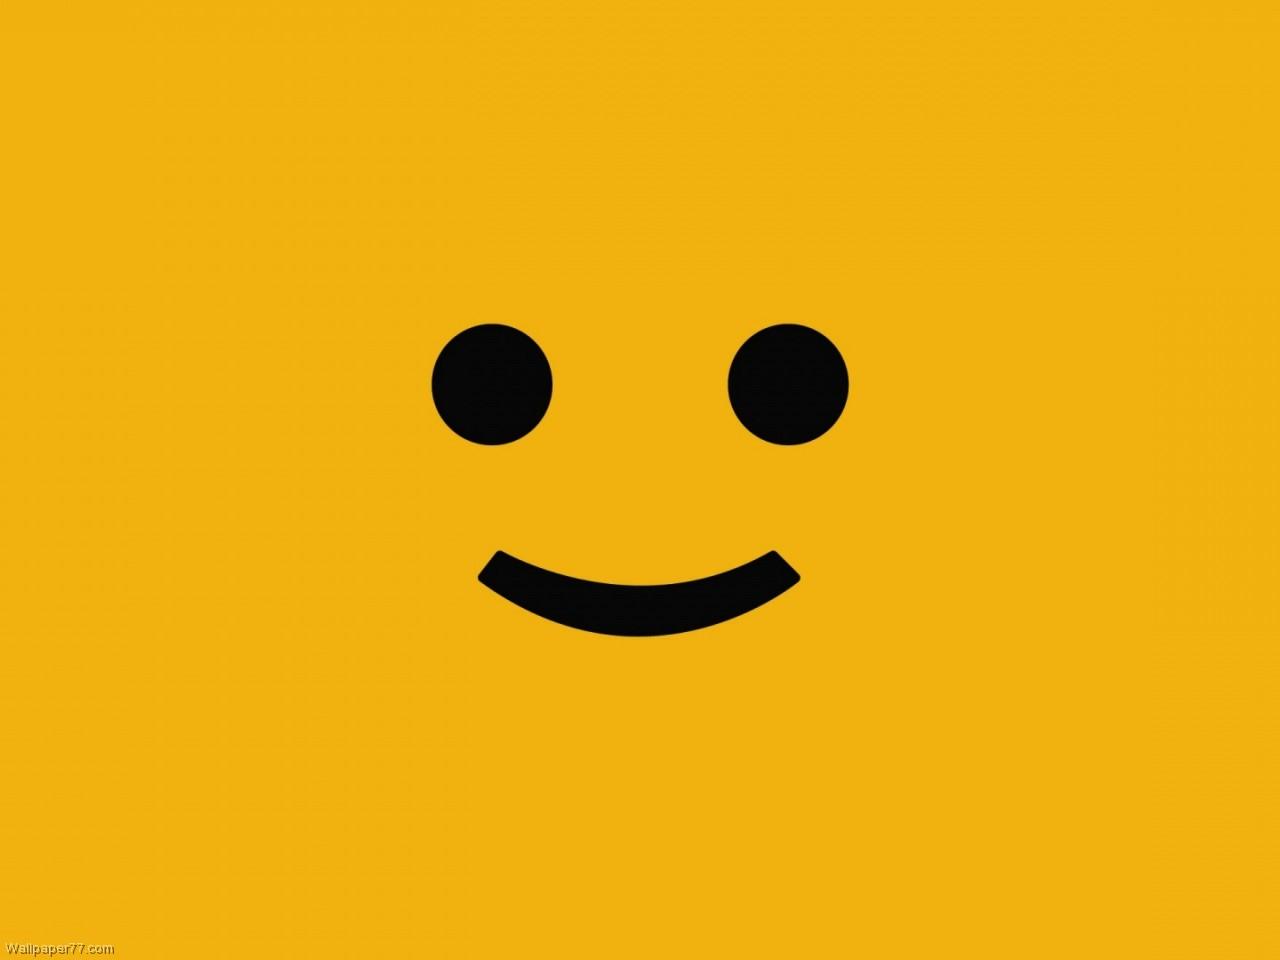 Smiley Face Backgrounds Smiley face background 1280x960